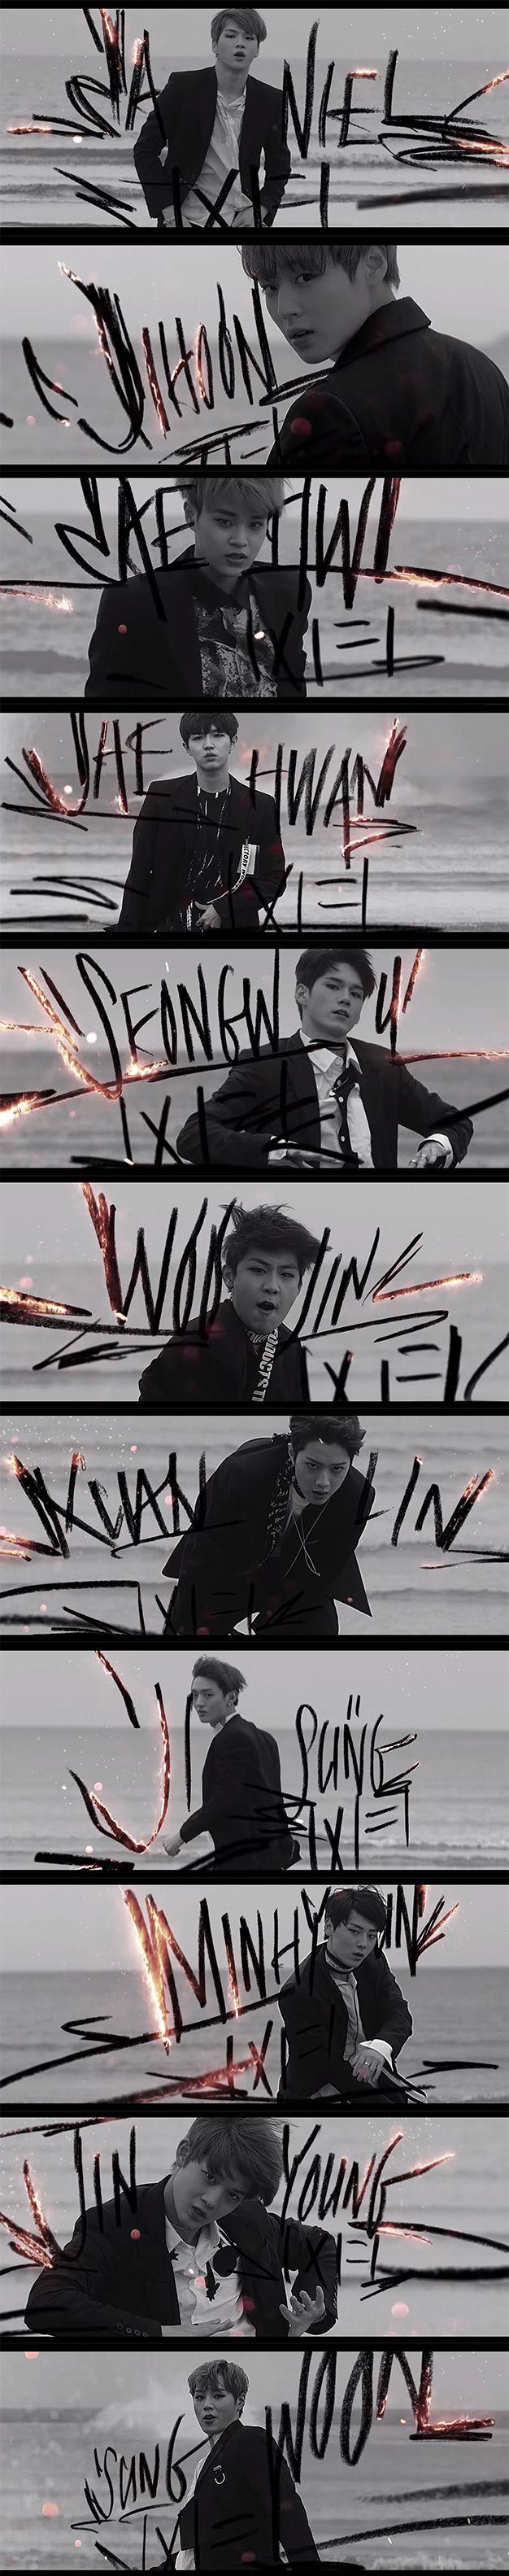 Wanna One - Burn it up MV